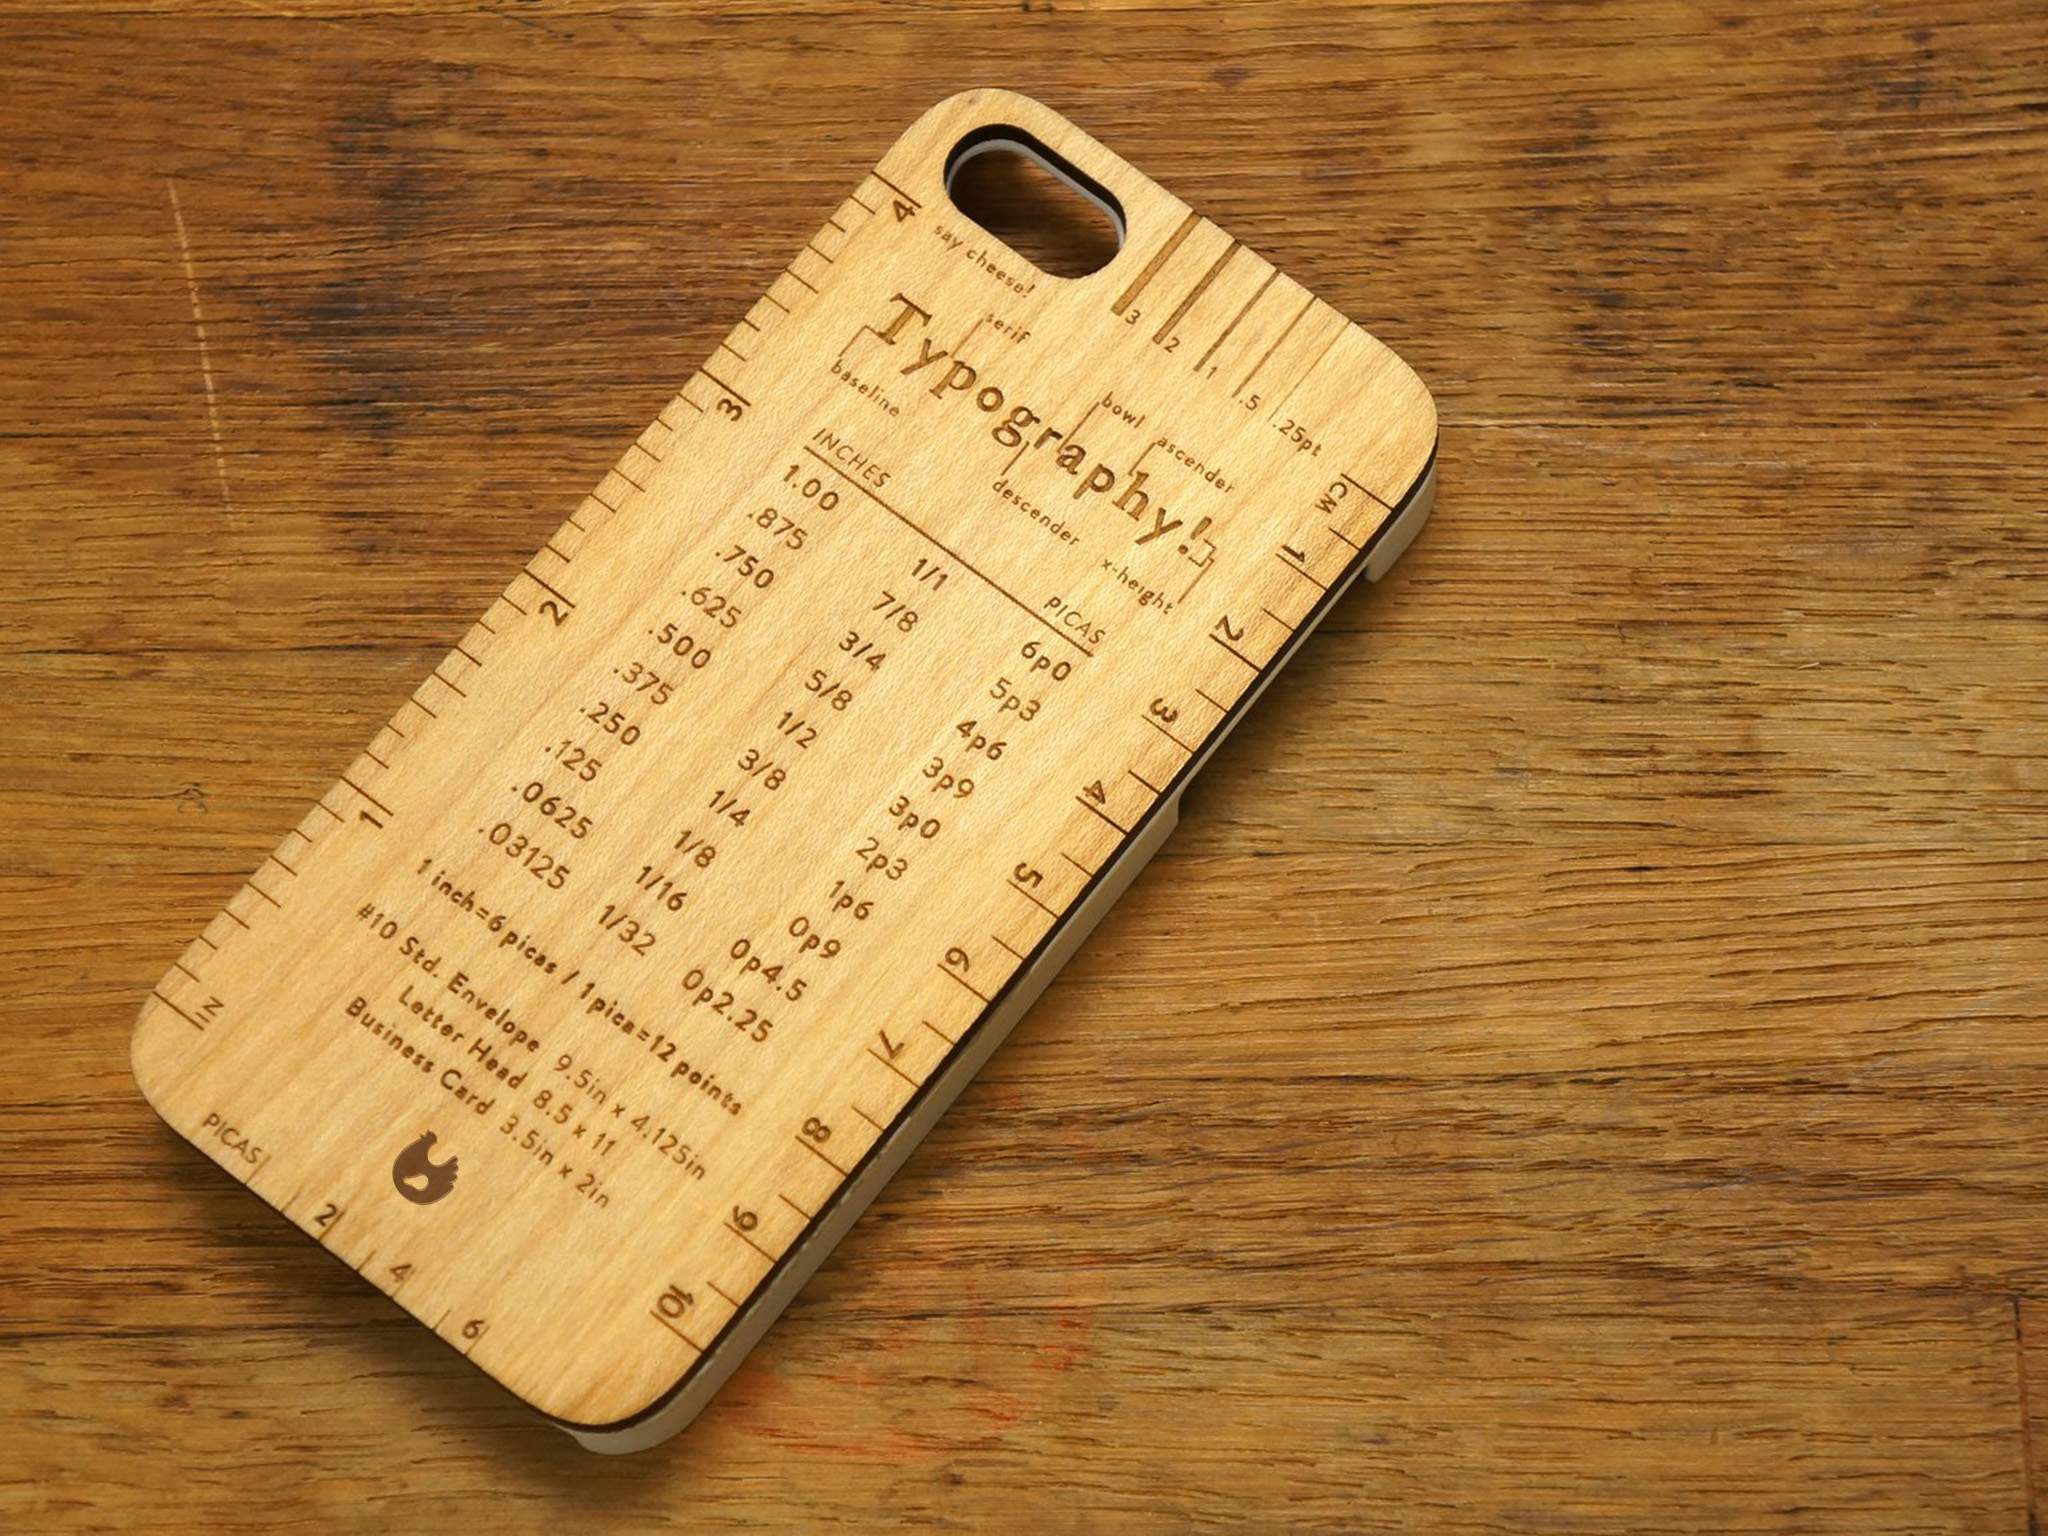 iphone_horizontal_0006_Vector Smart Object copy.jpg